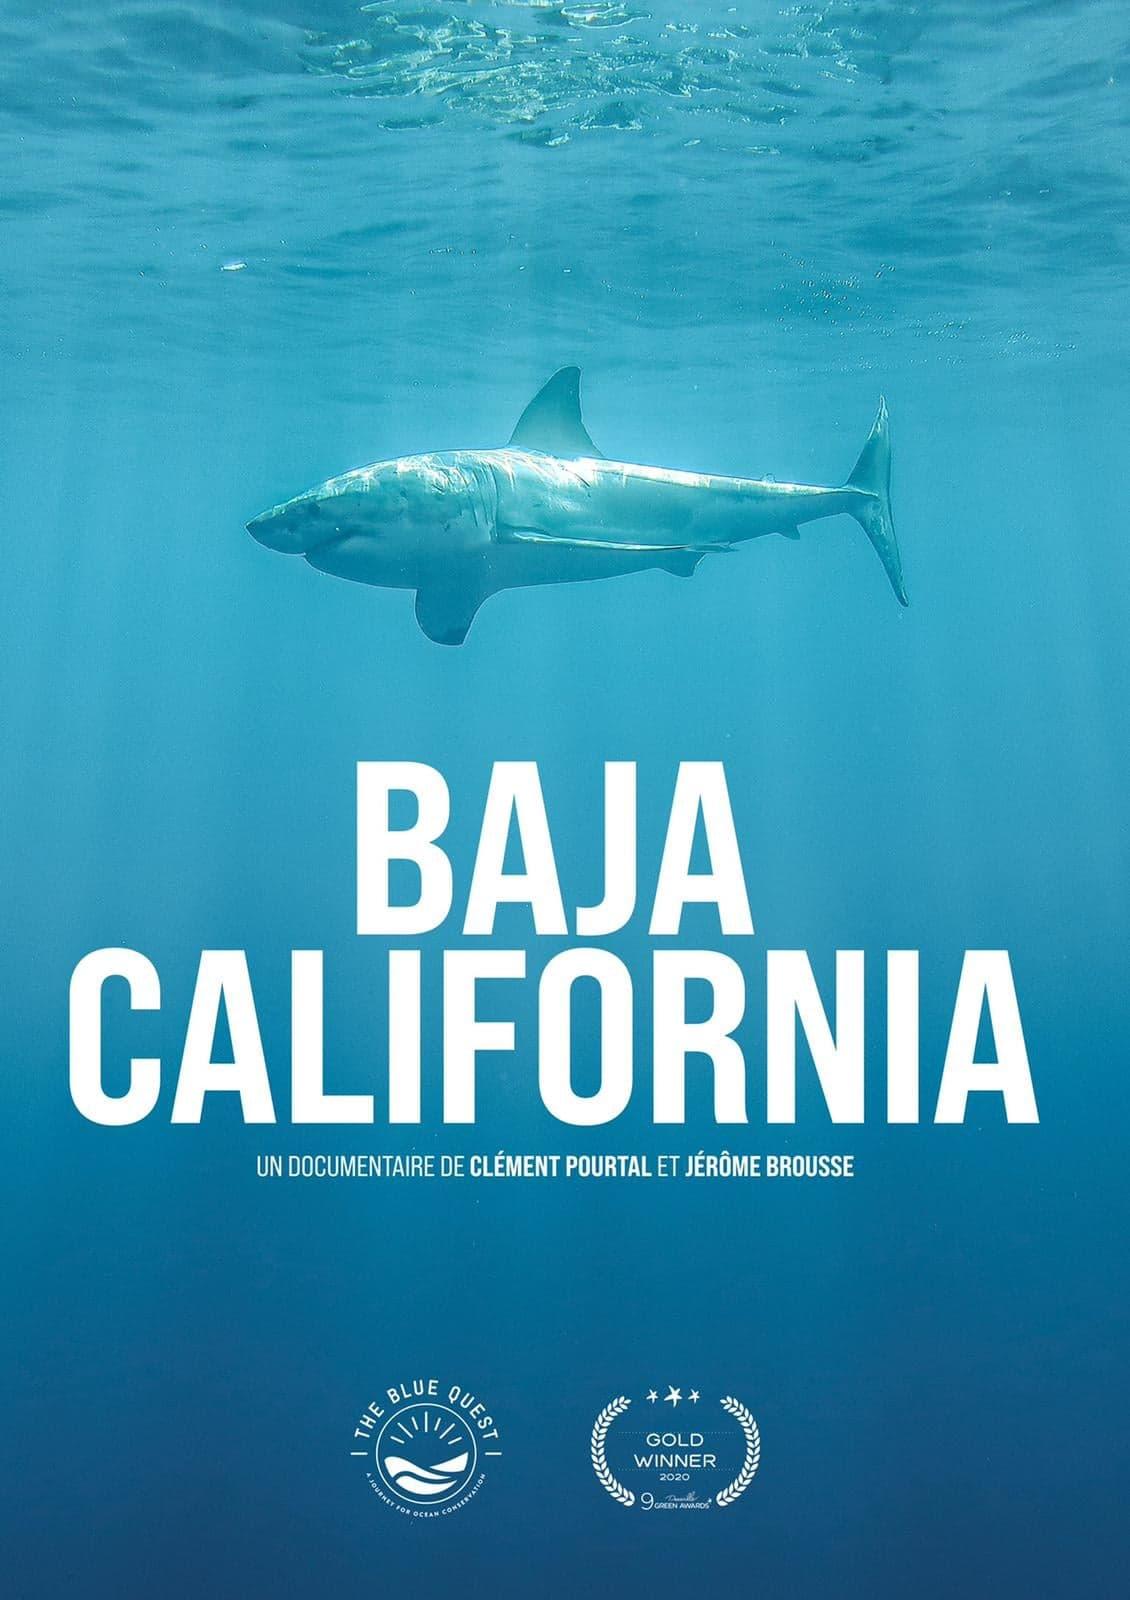 The blue quest / Baja california